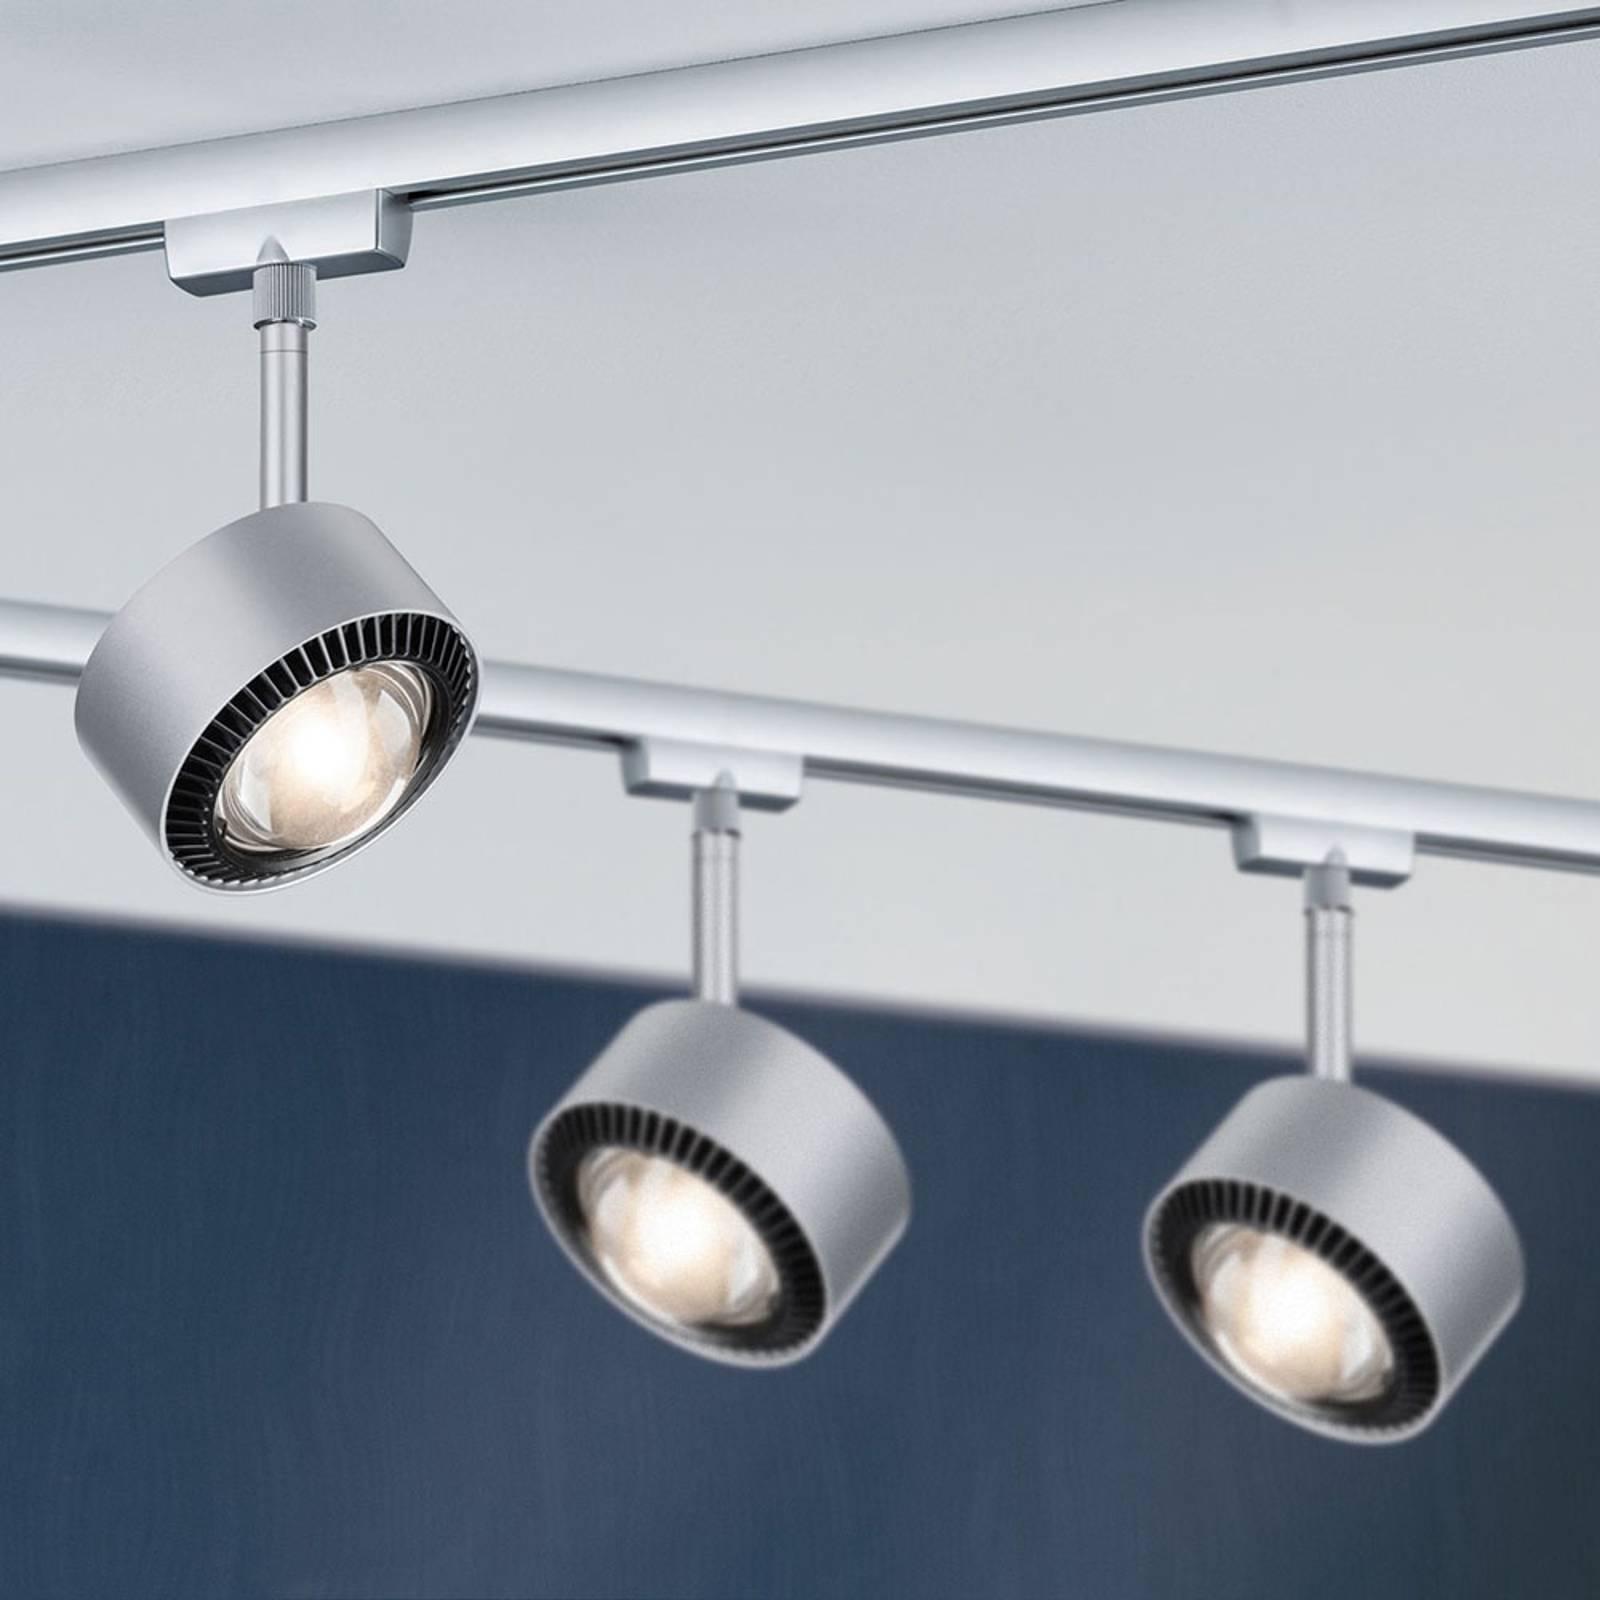 Paulmann-LED-kohdevalaisin Aldan URail kromi/musta